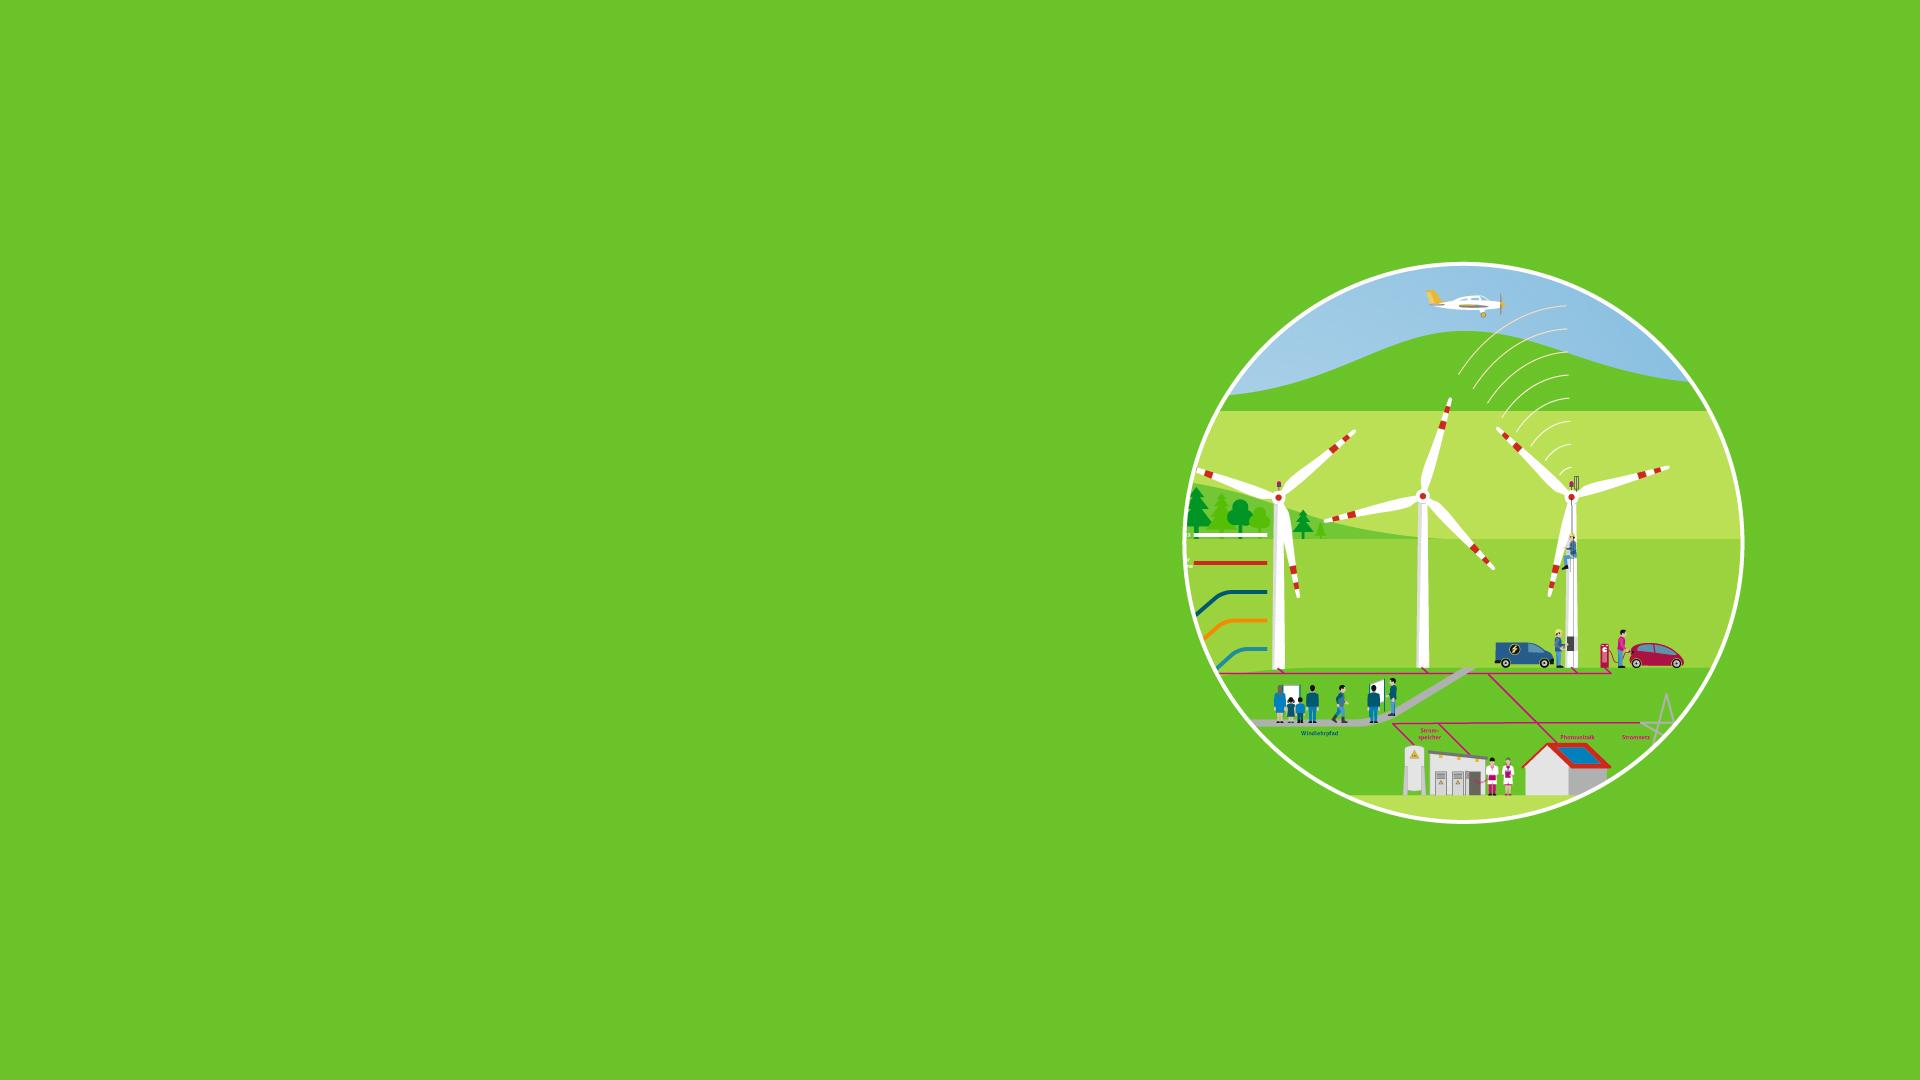 bwe-windenergie